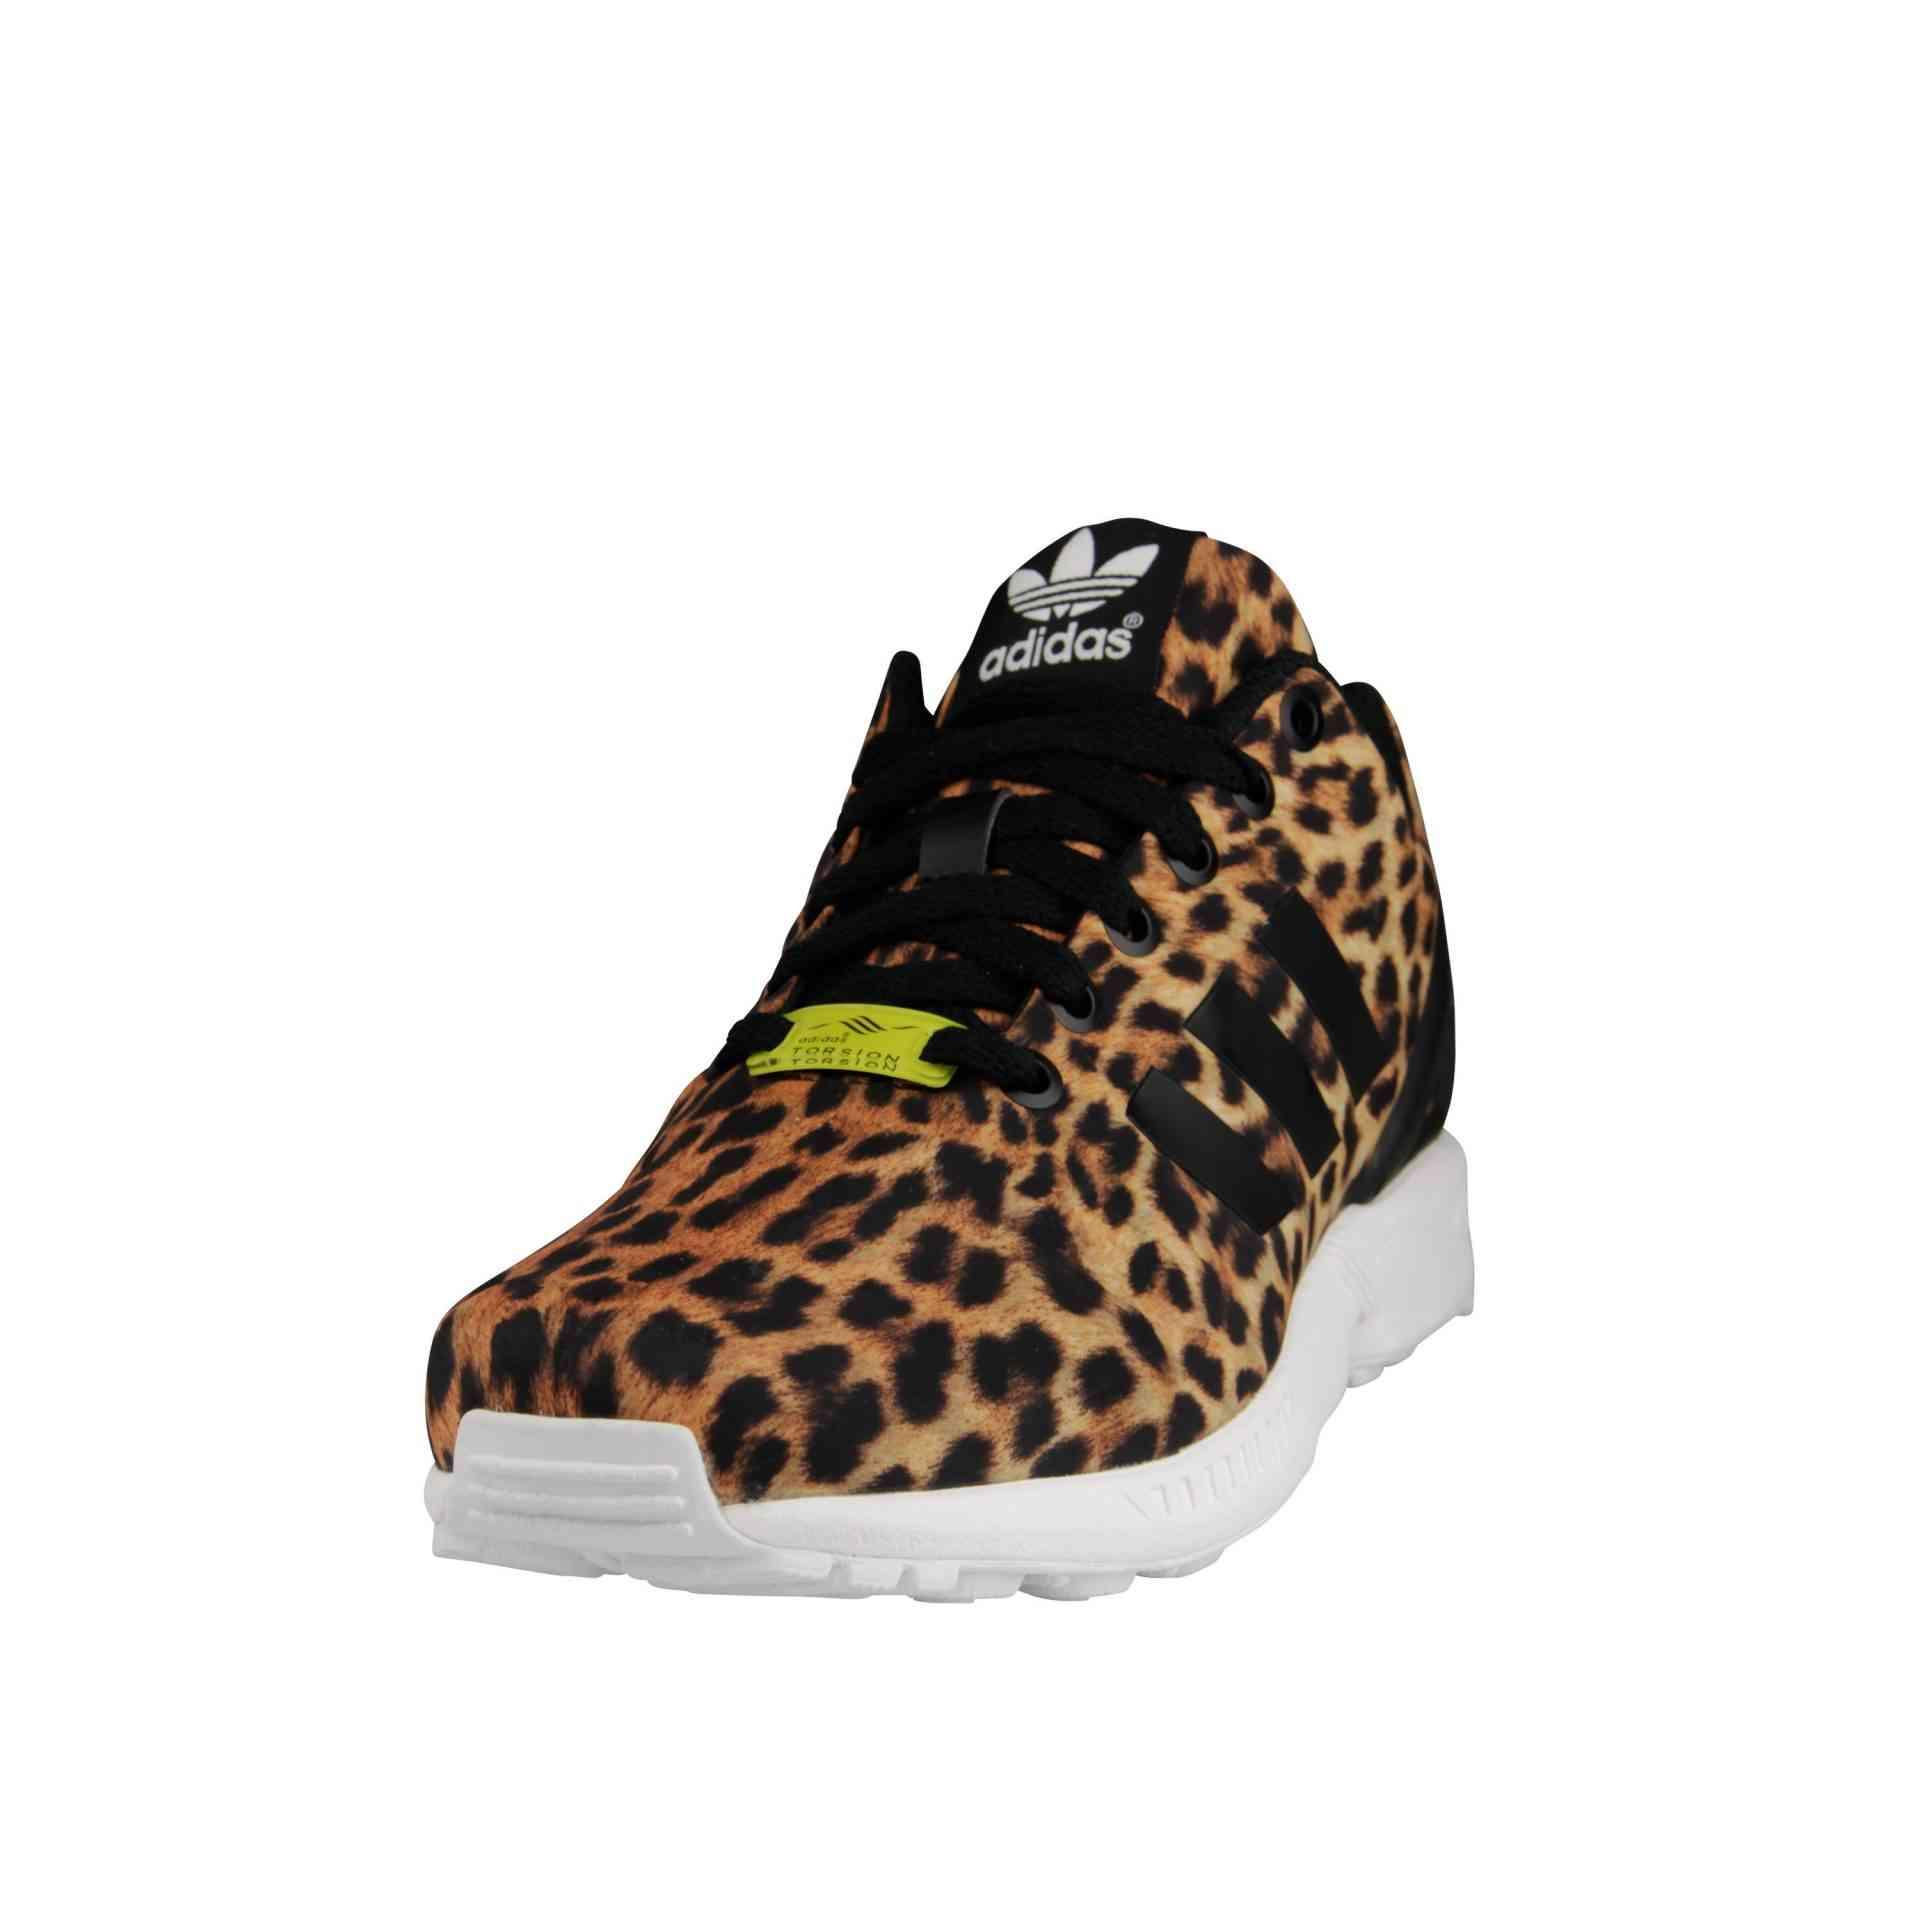 adidas zx flux leopard